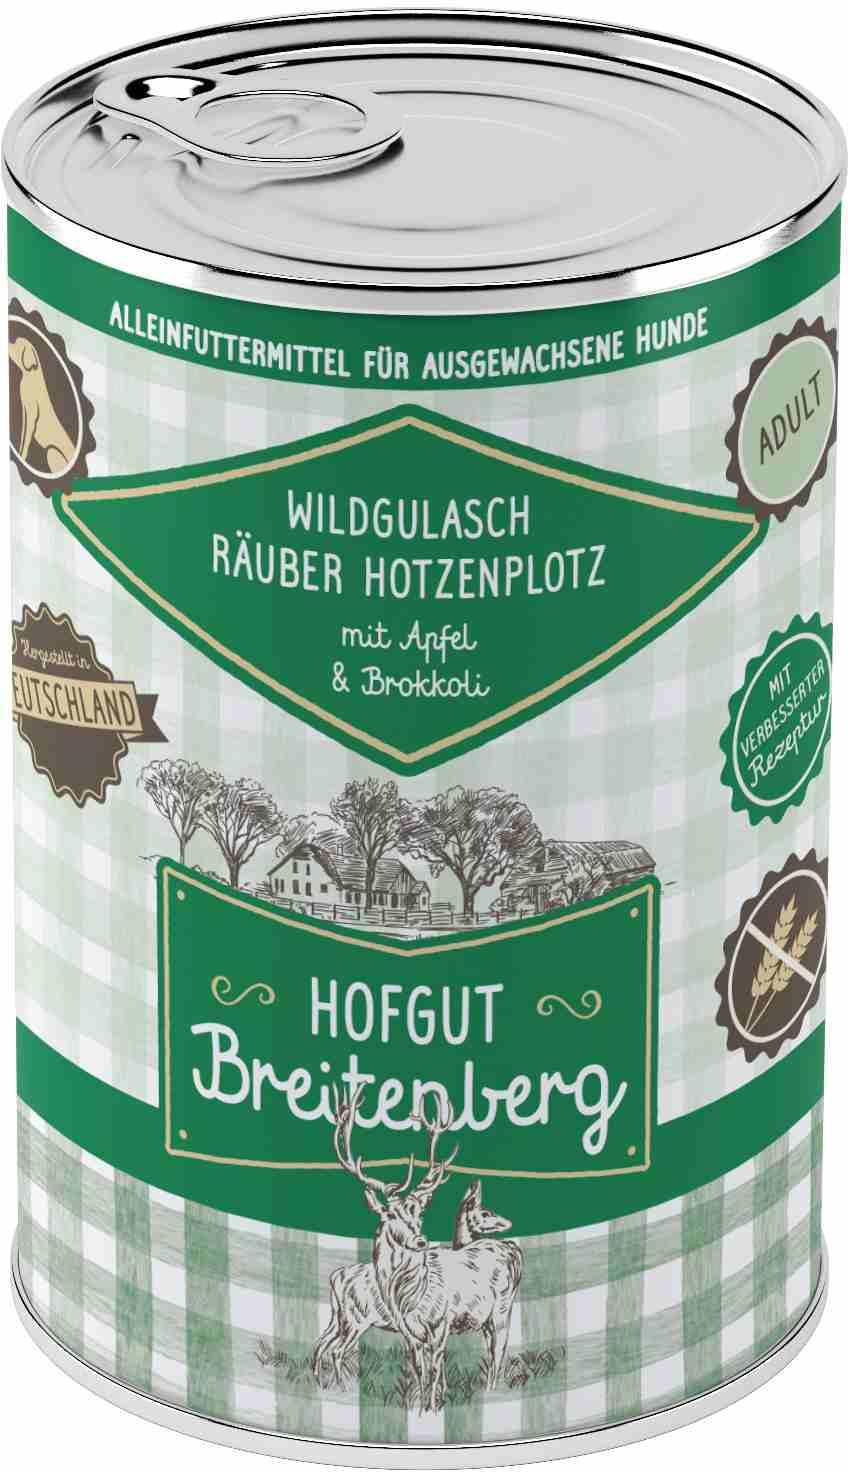 Hofgut Breitenberg Dog Räuber Hotzenplotz 400g